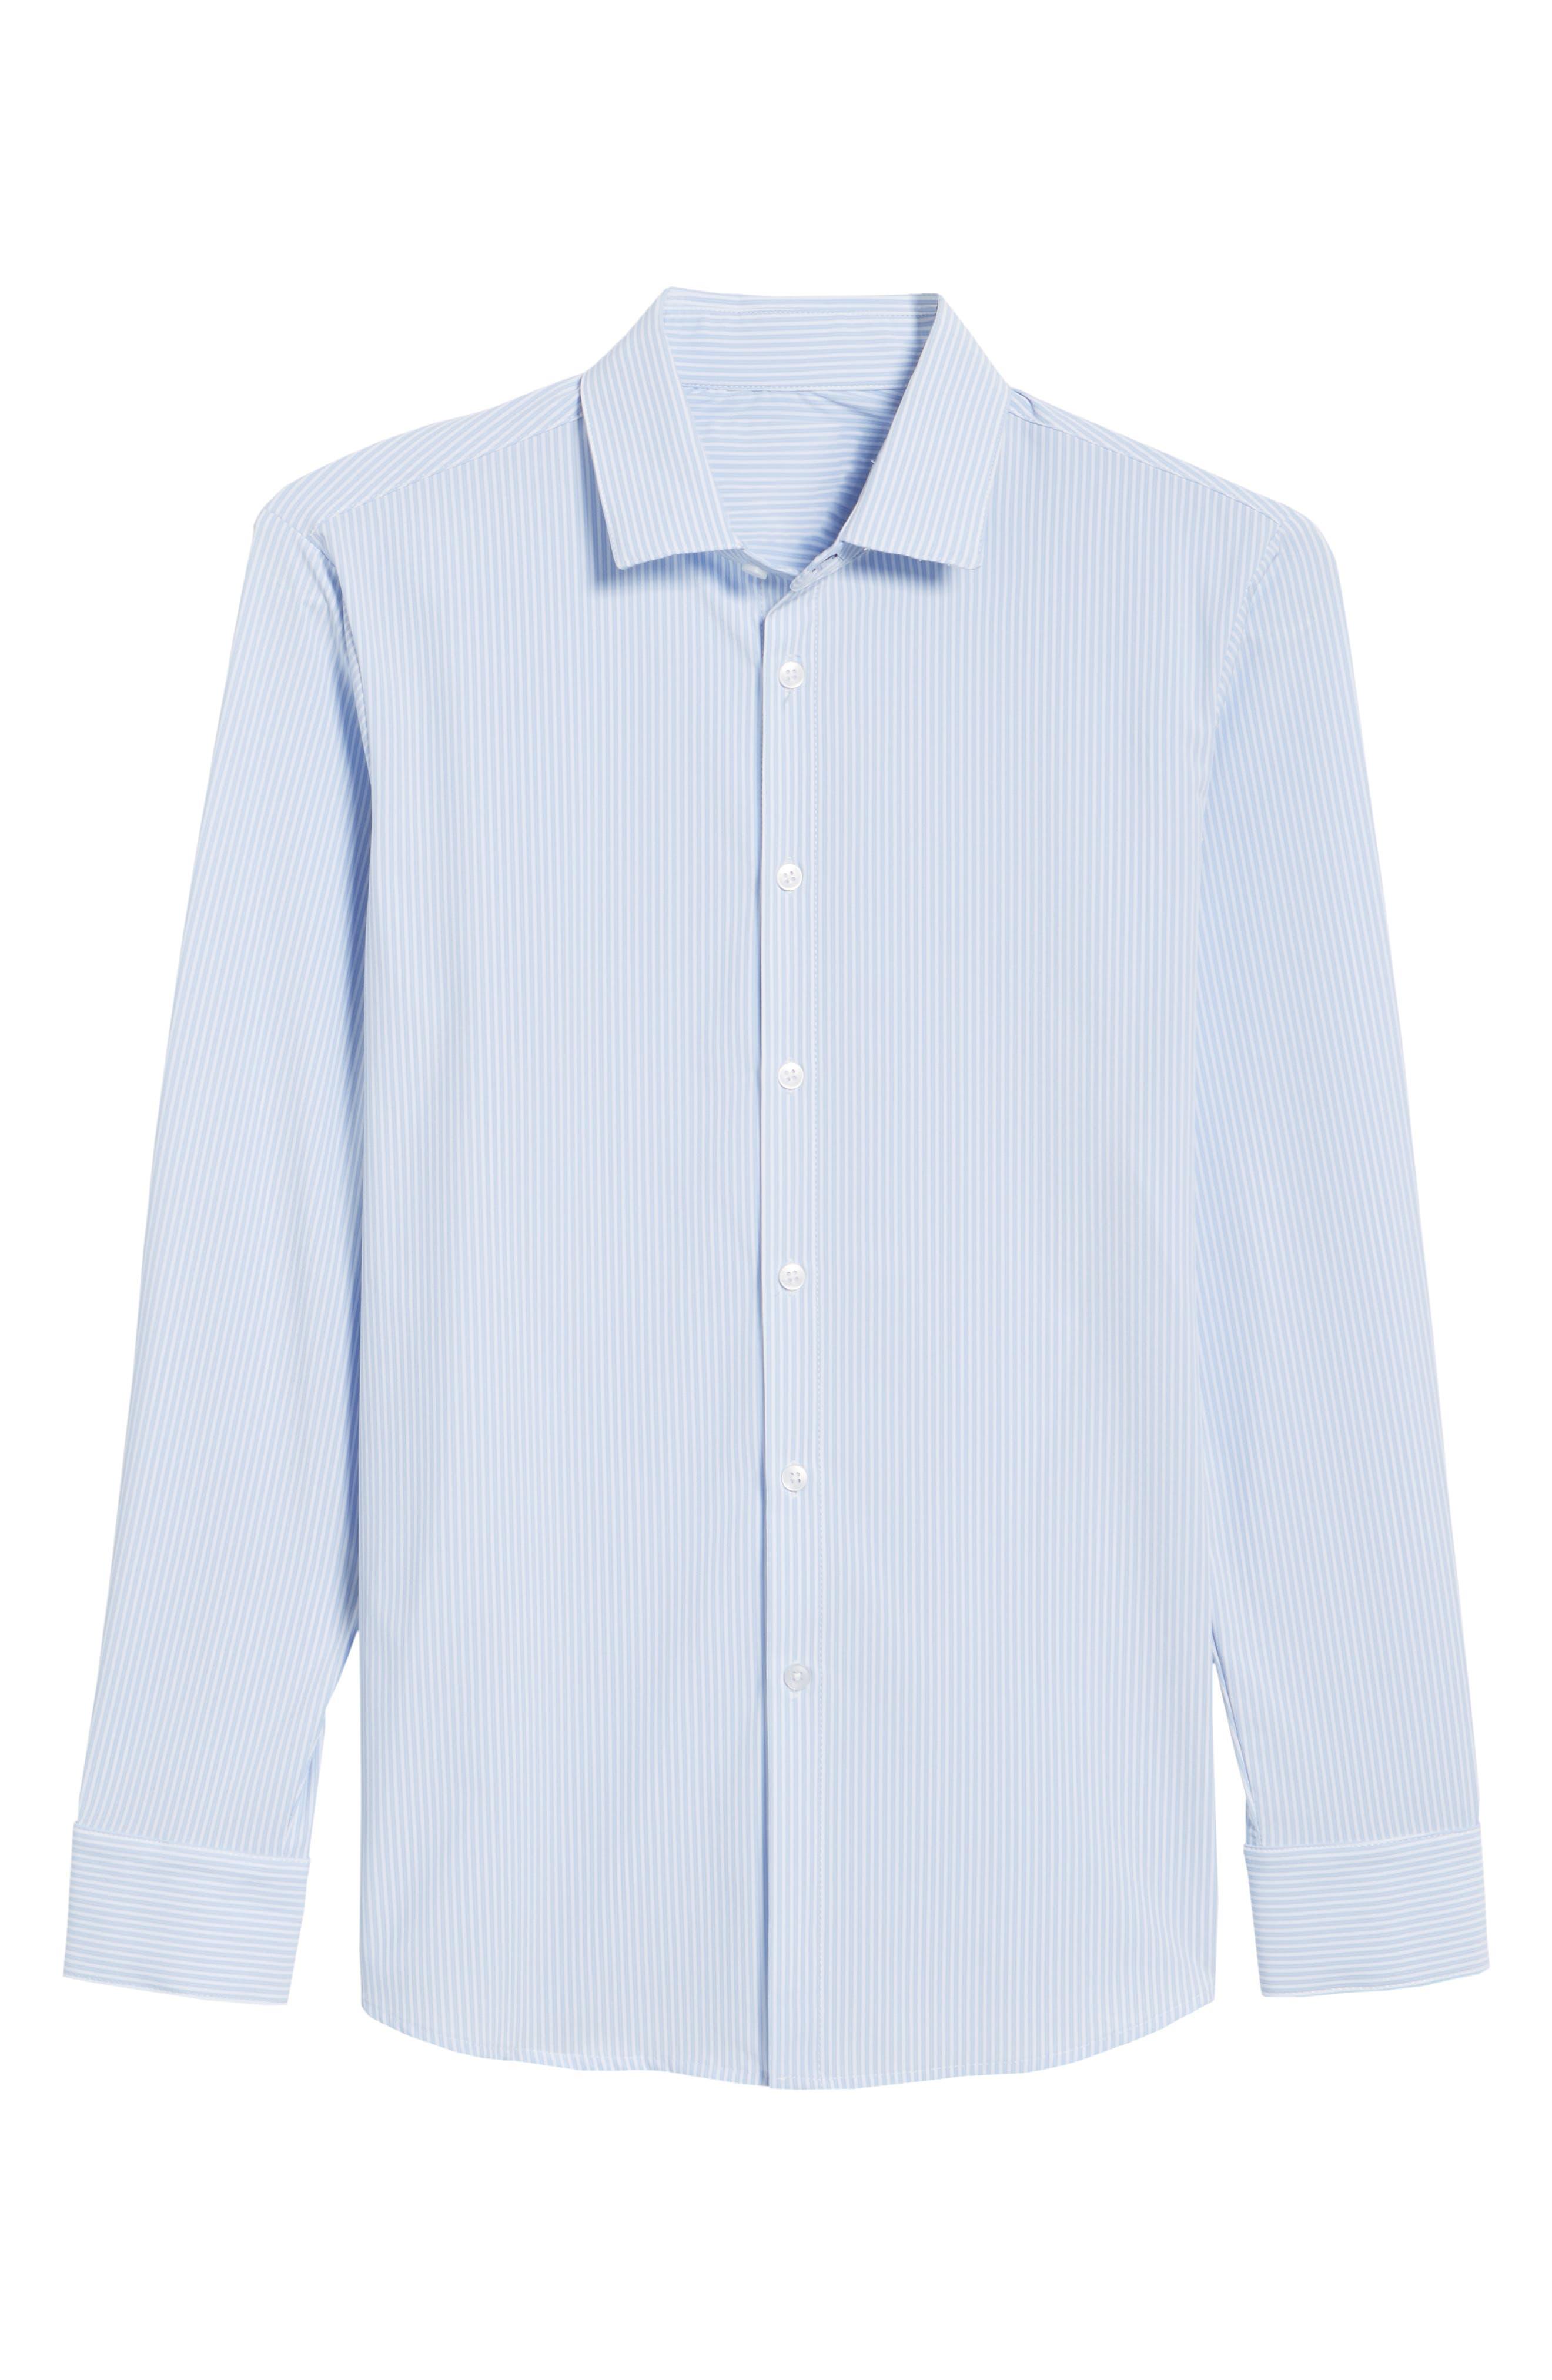 Caldwell Slim Fit Stripe Sport Shirt,                             Alternate thumbnail 6, color,                             Blue